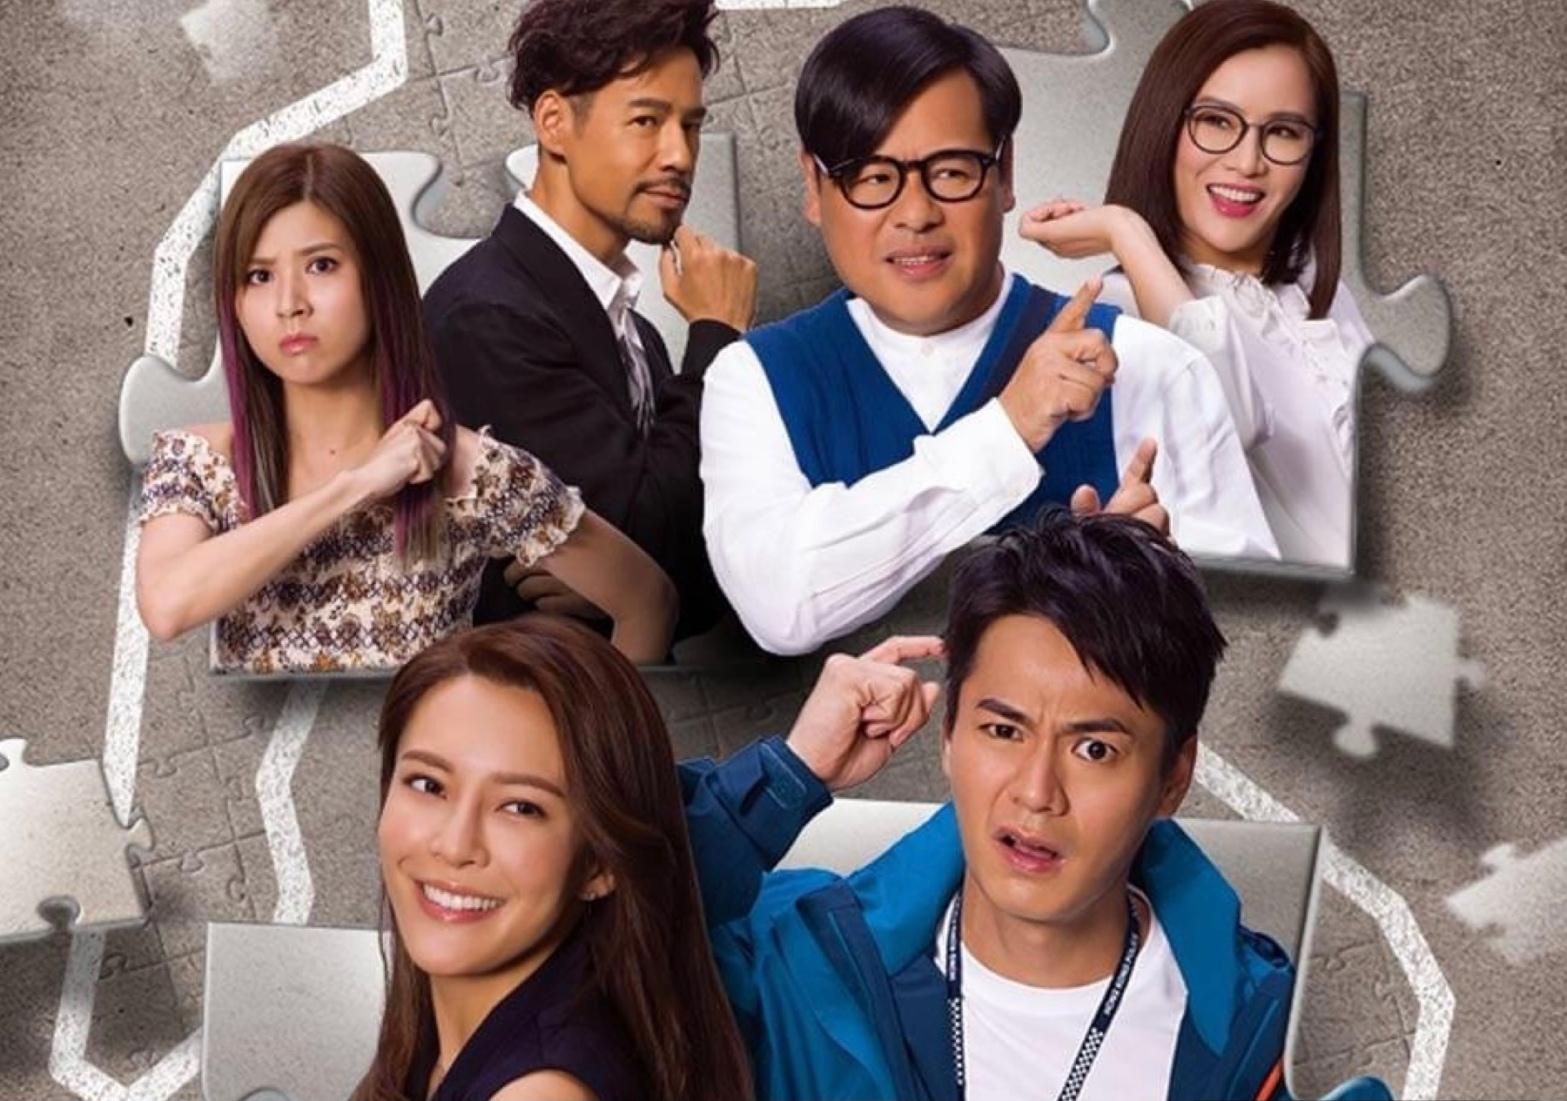 The Witness 木棘証人, TVB Drama poster